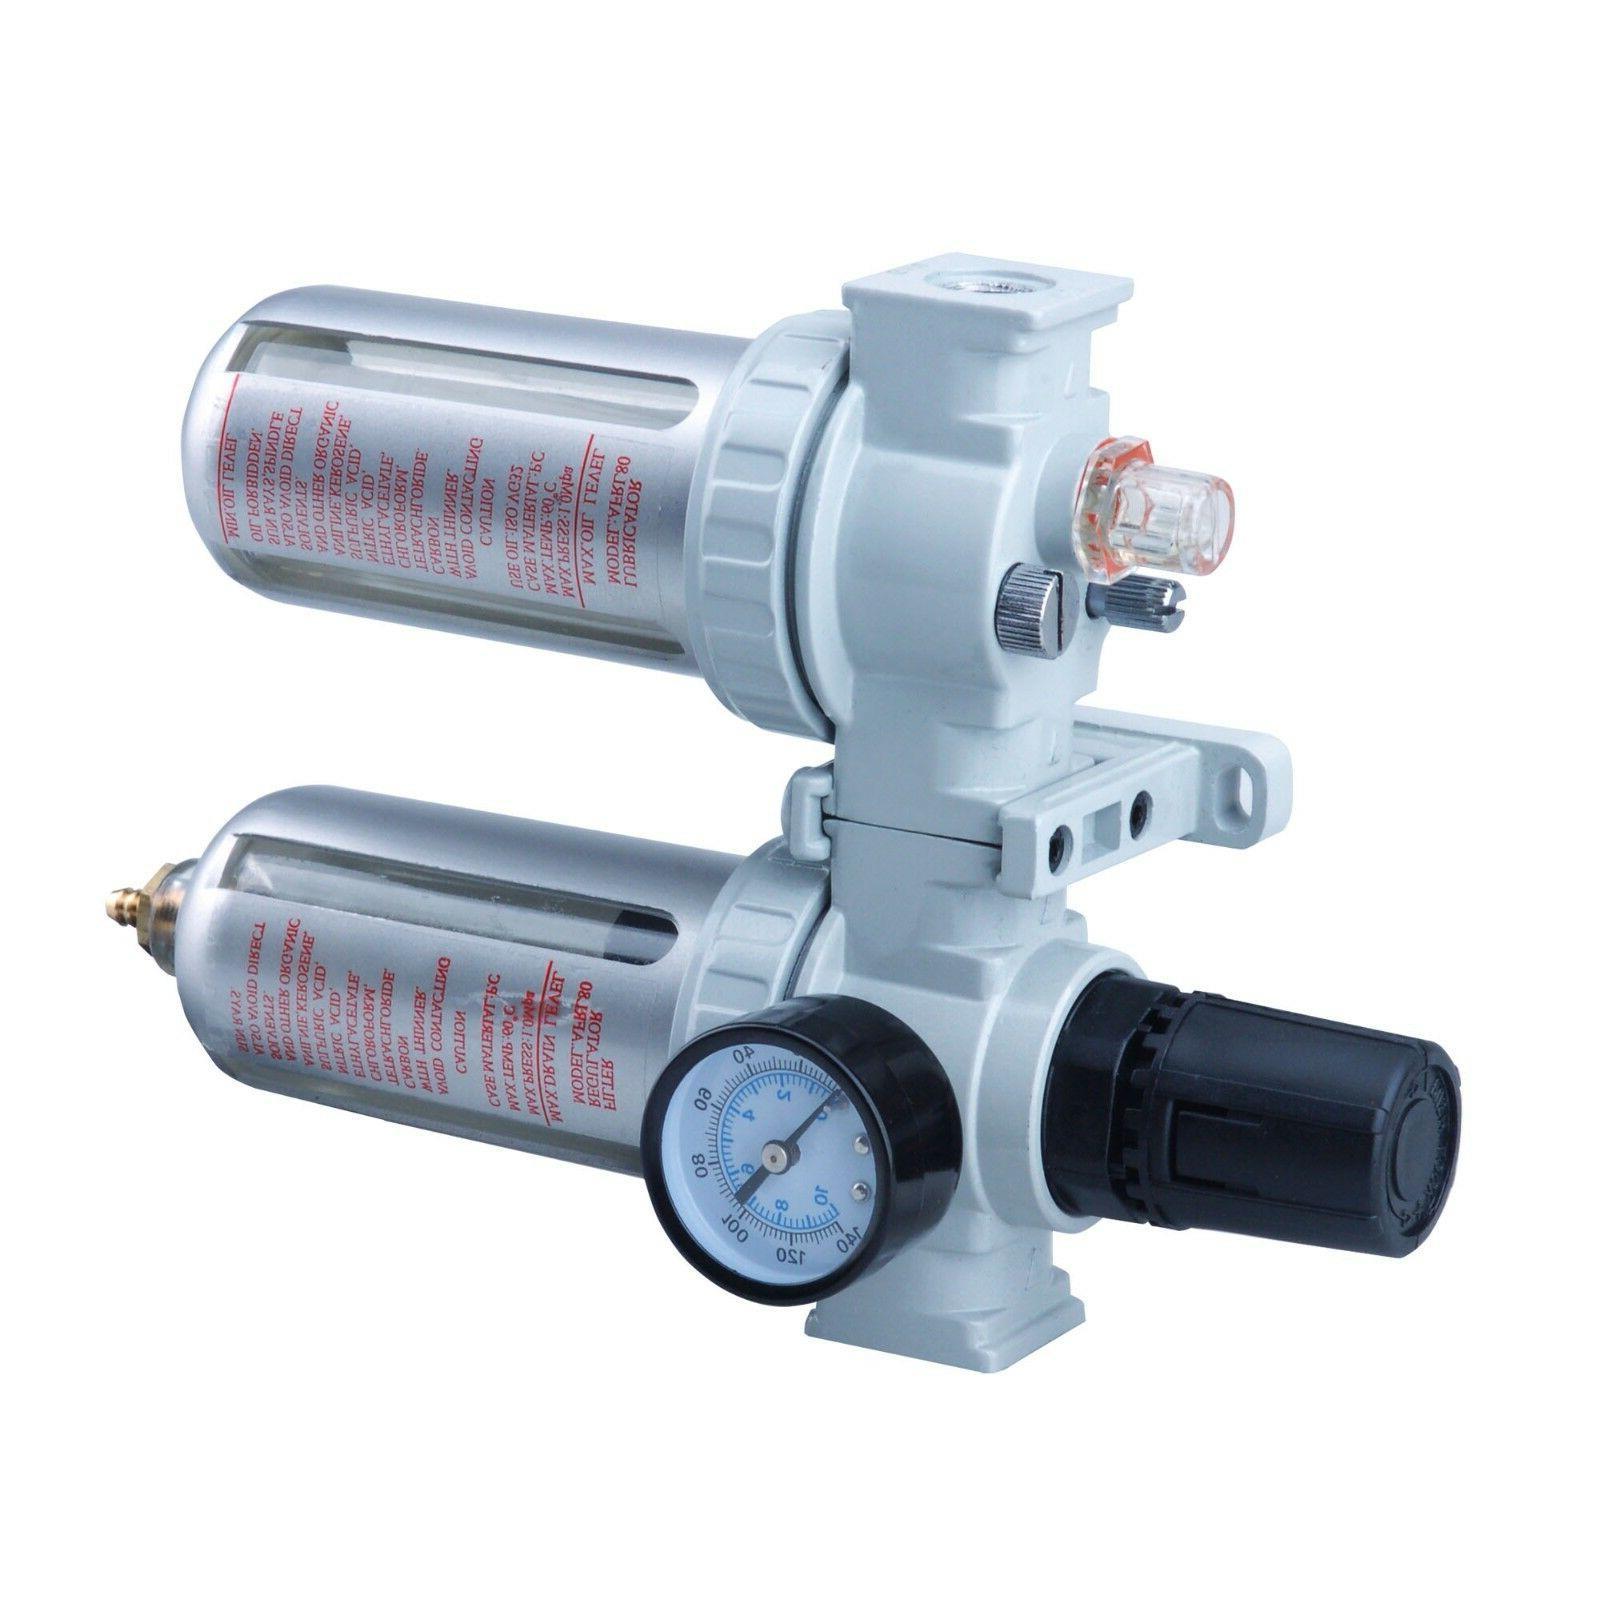 Speedway Filter Regulator and Lubricator Water